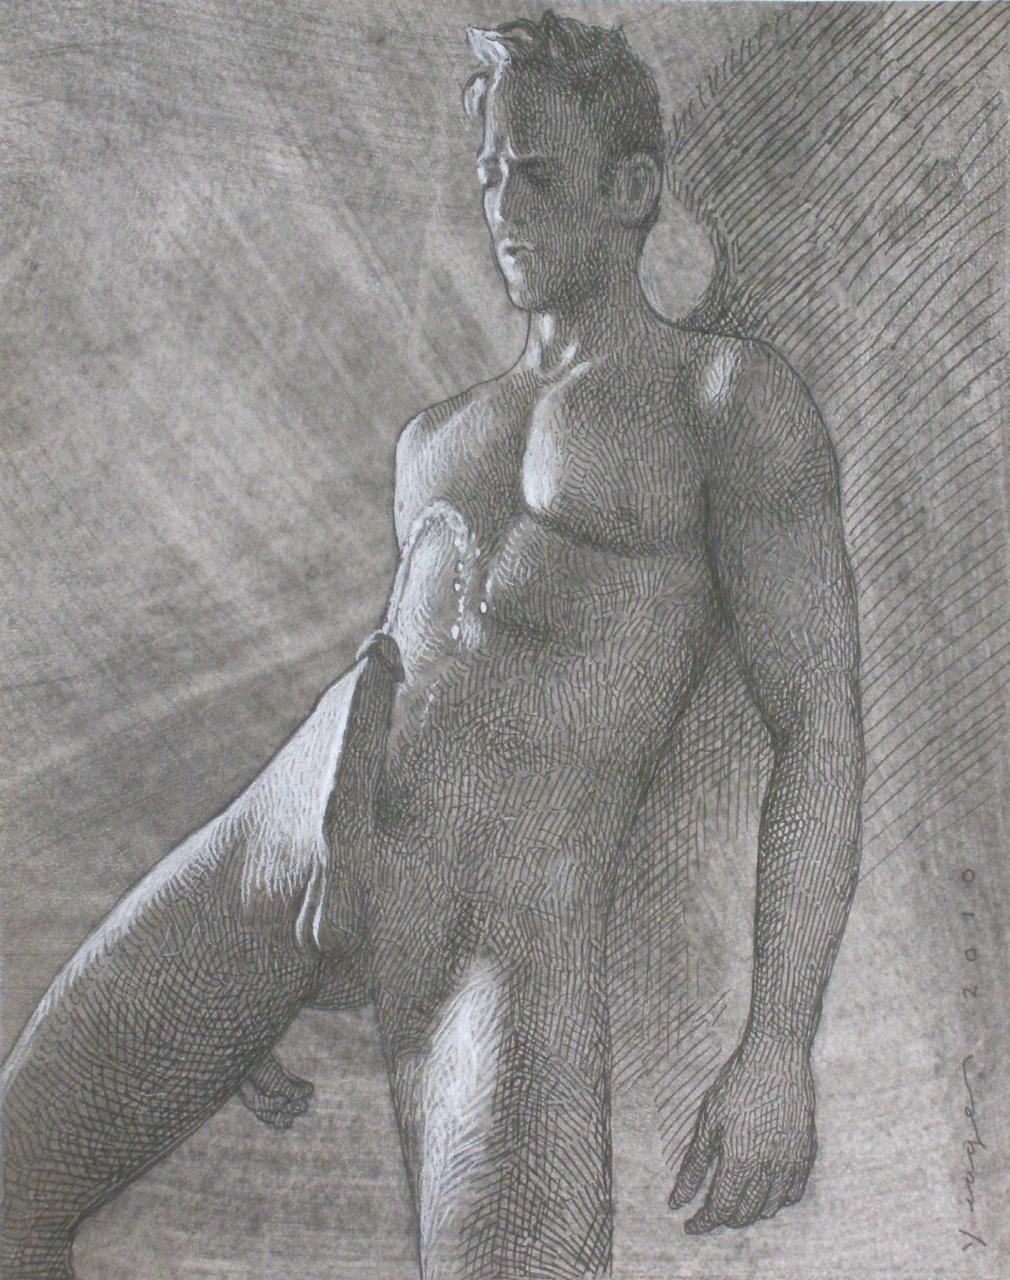 franco-gay-erotic-drawings-ask-busty-jolene